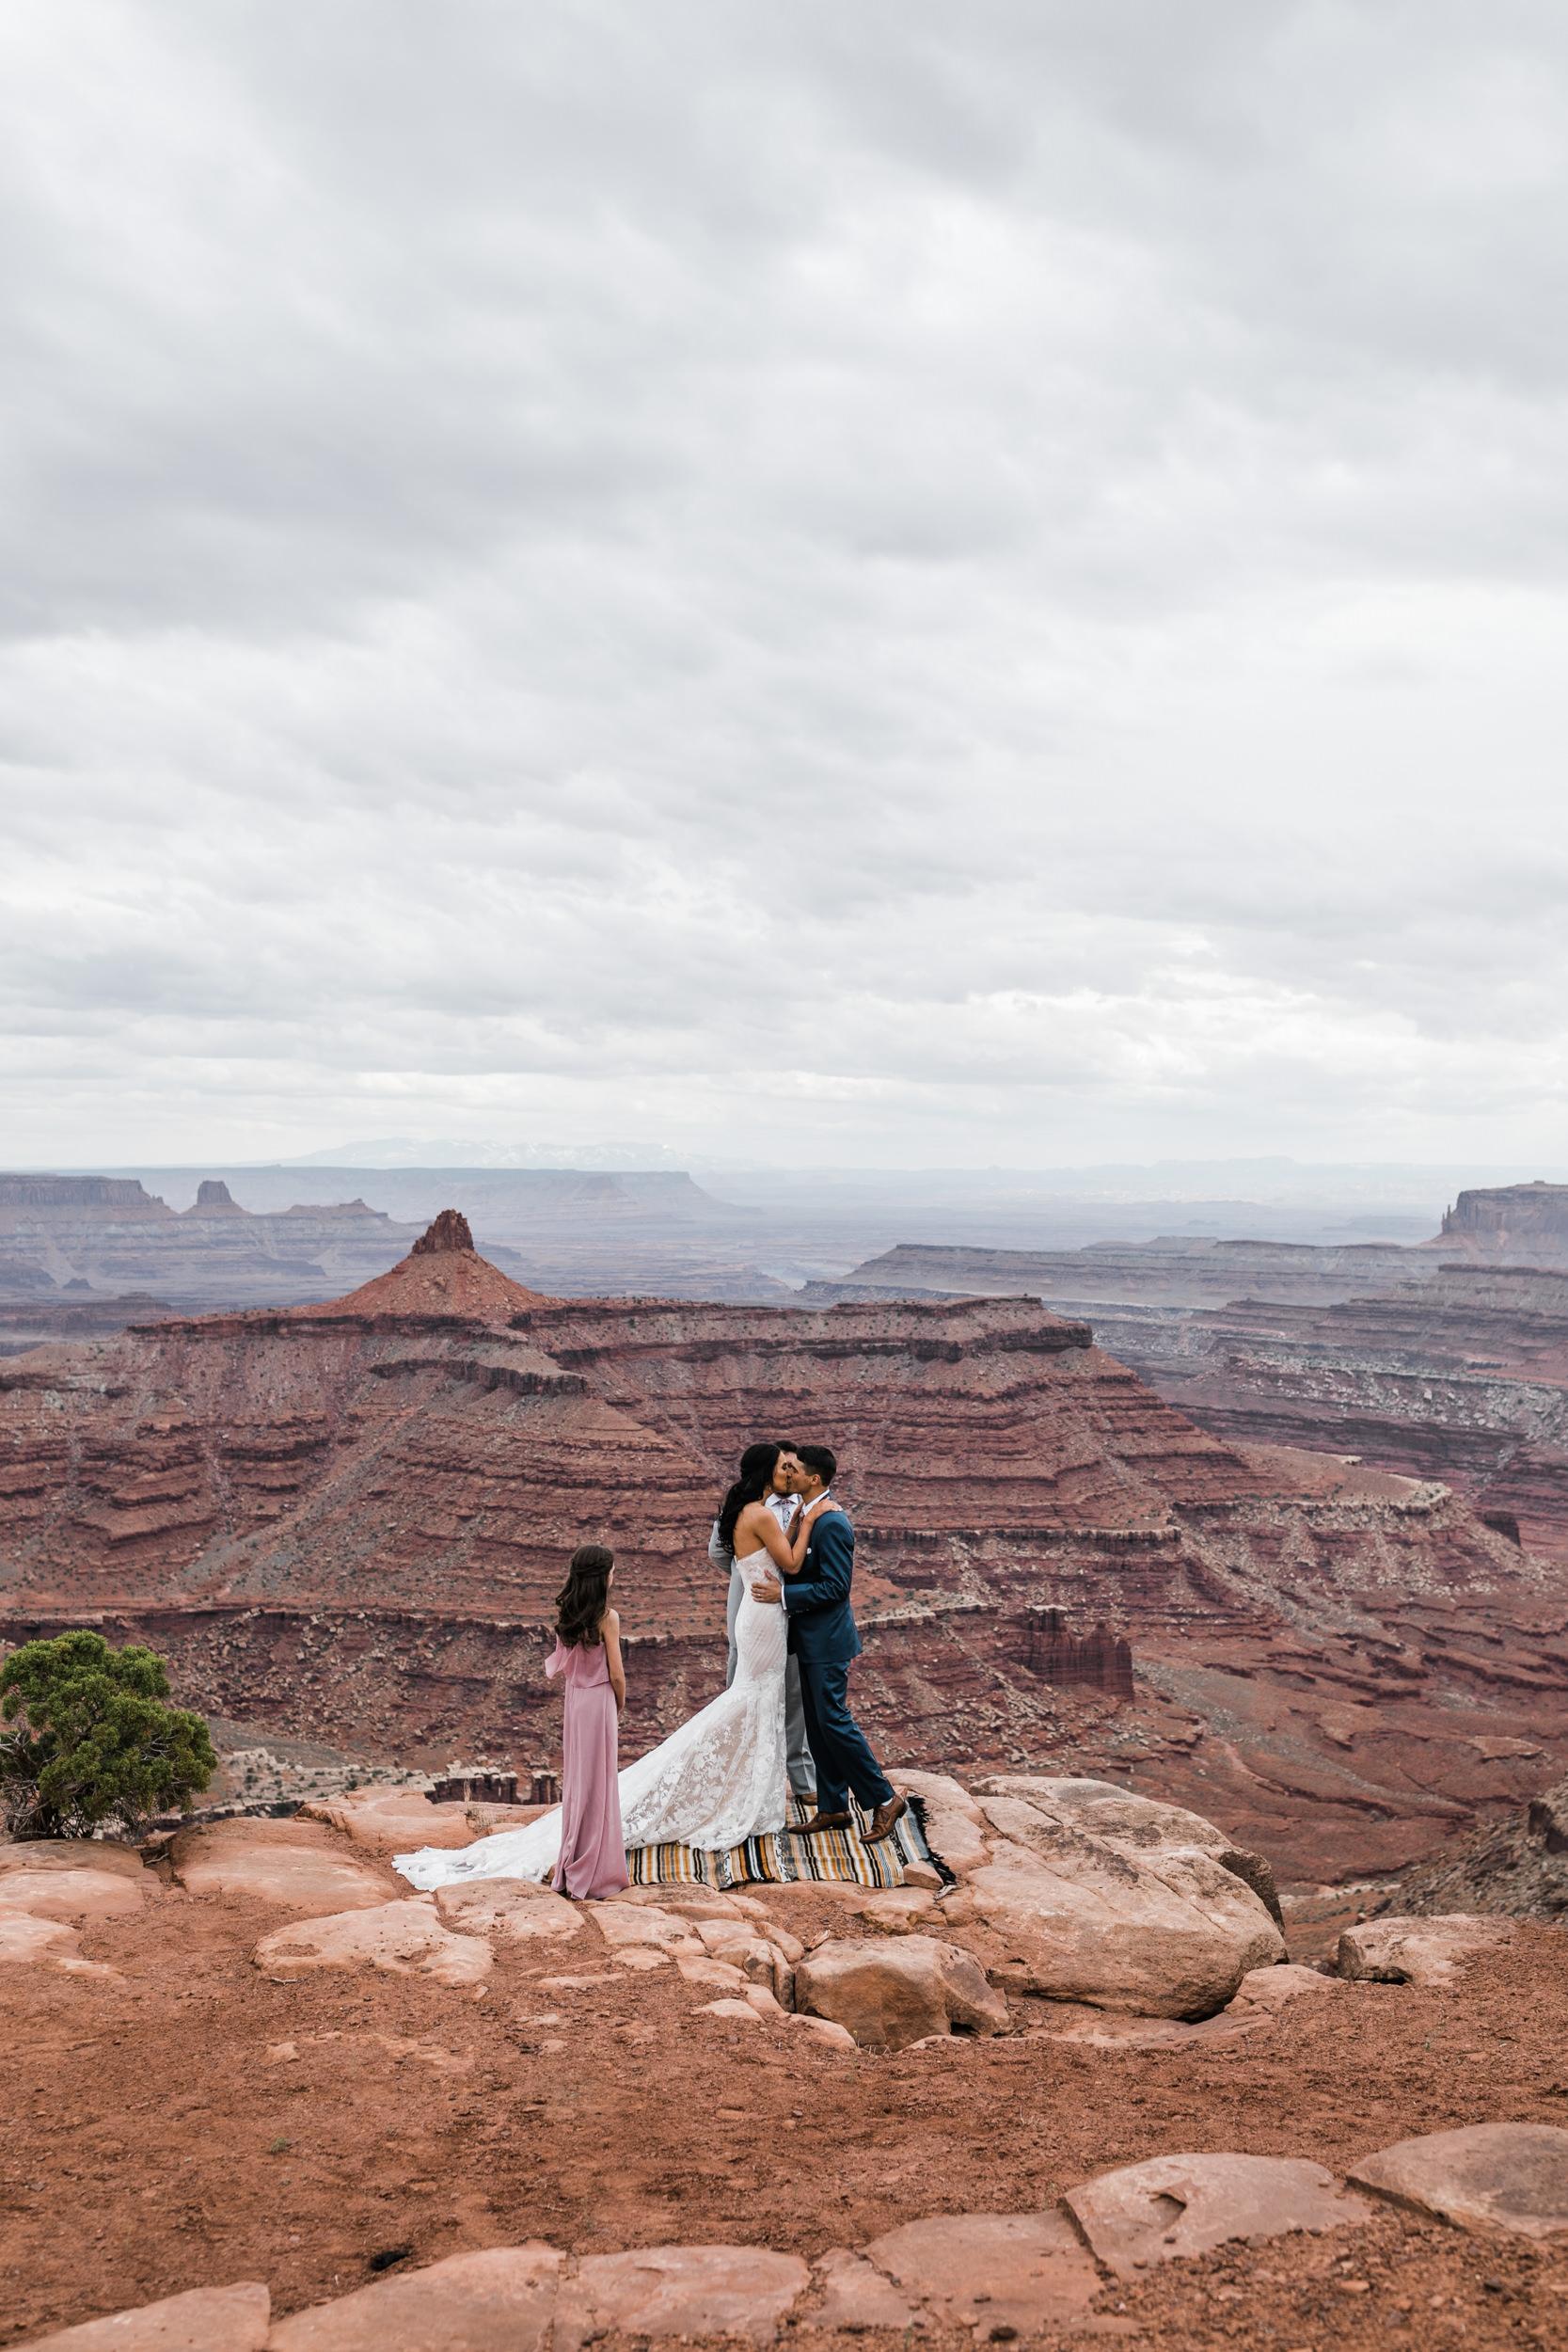 Jeep-Wedding-Moab-Utah-Hearnes-Adventure-Elopement-Photography-11.jpg